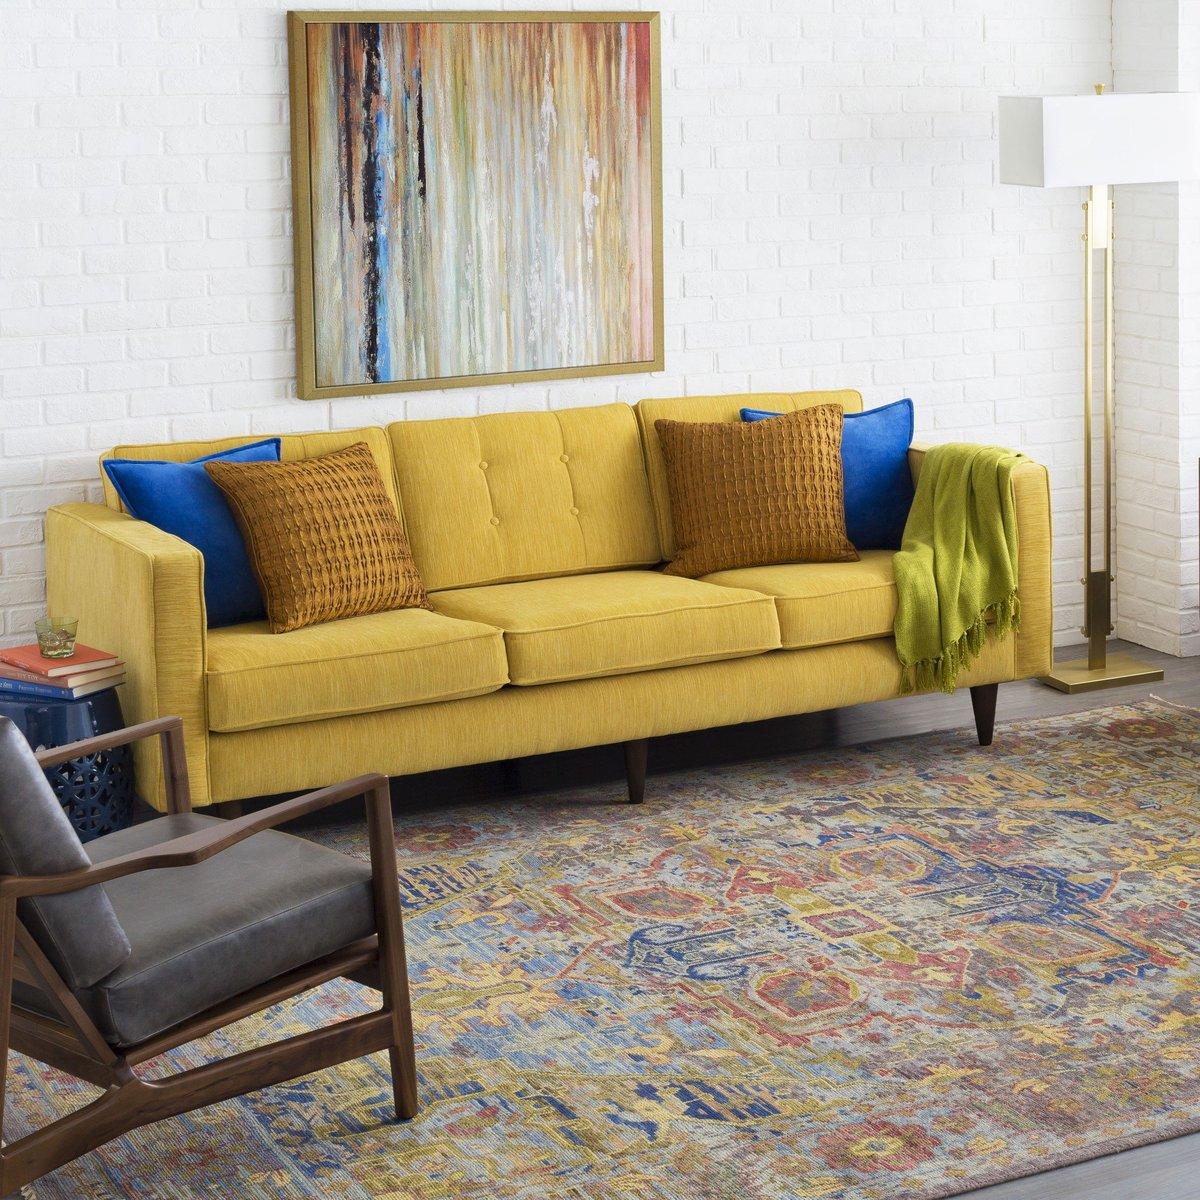 Stylishly Cozy Room Decor Ideas